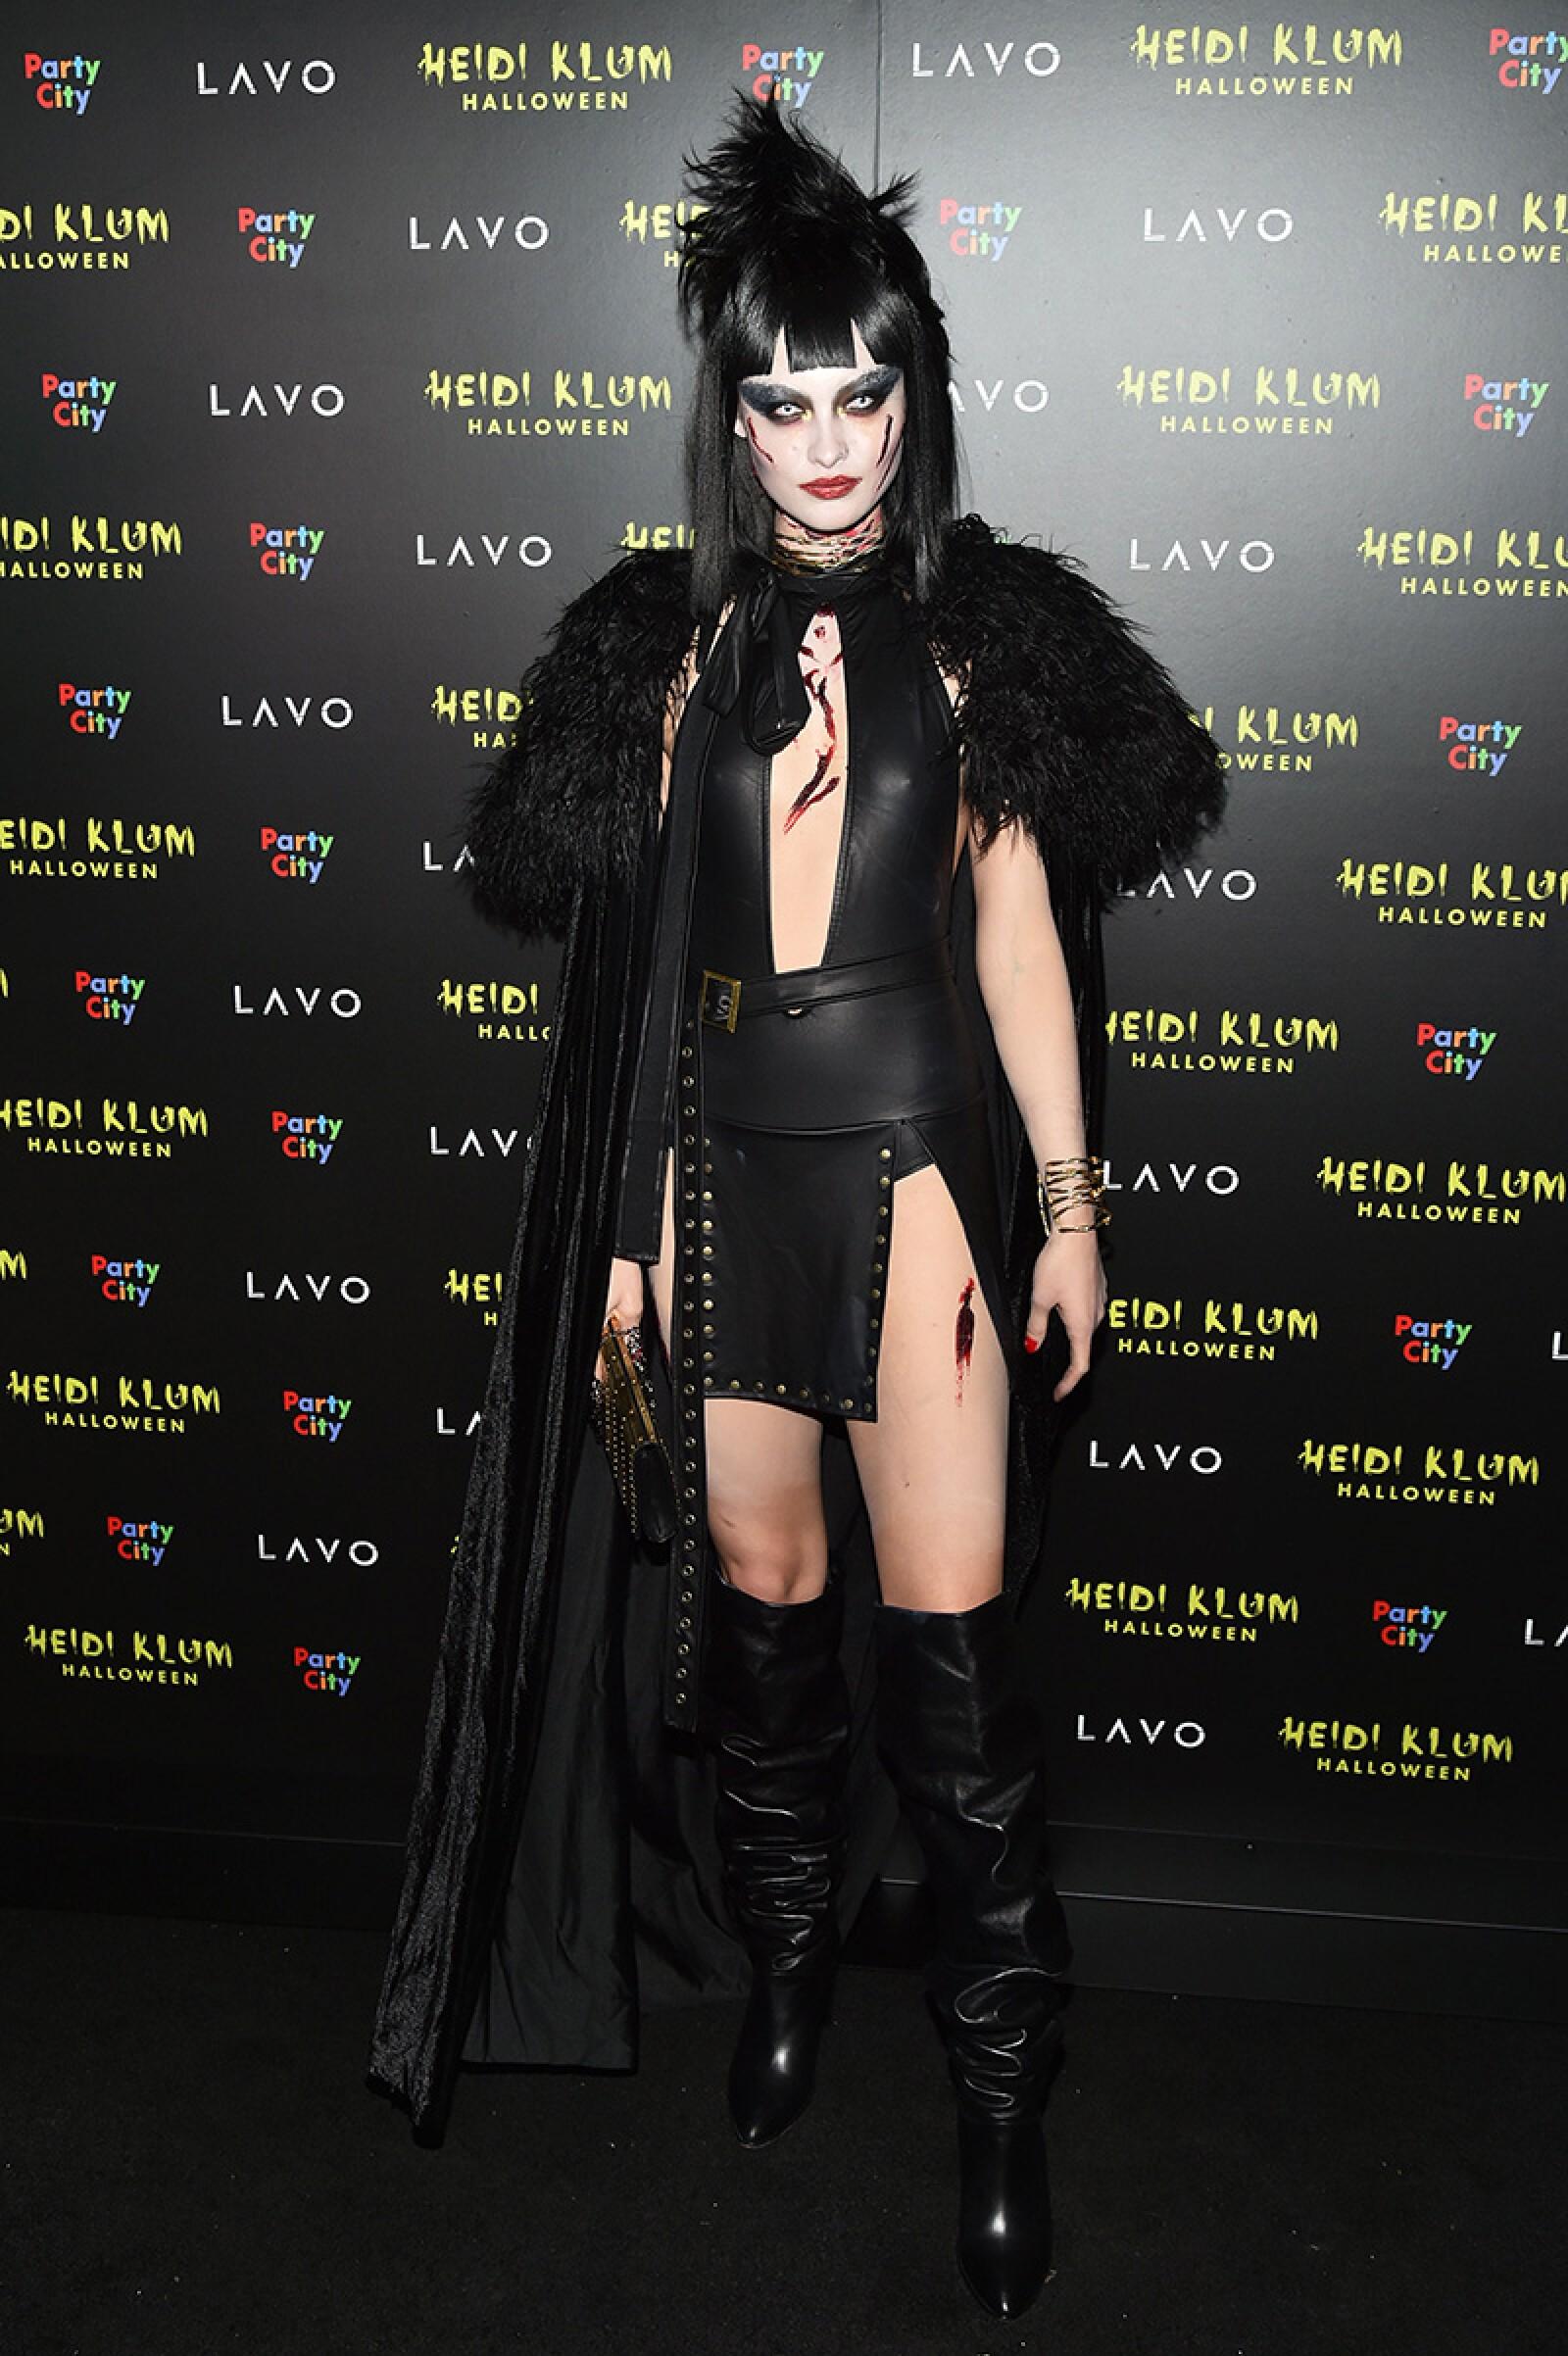 Heidi Klum's 19th Annual Halloween Party, Arrivals, New York, USA - 31 Oct 2018